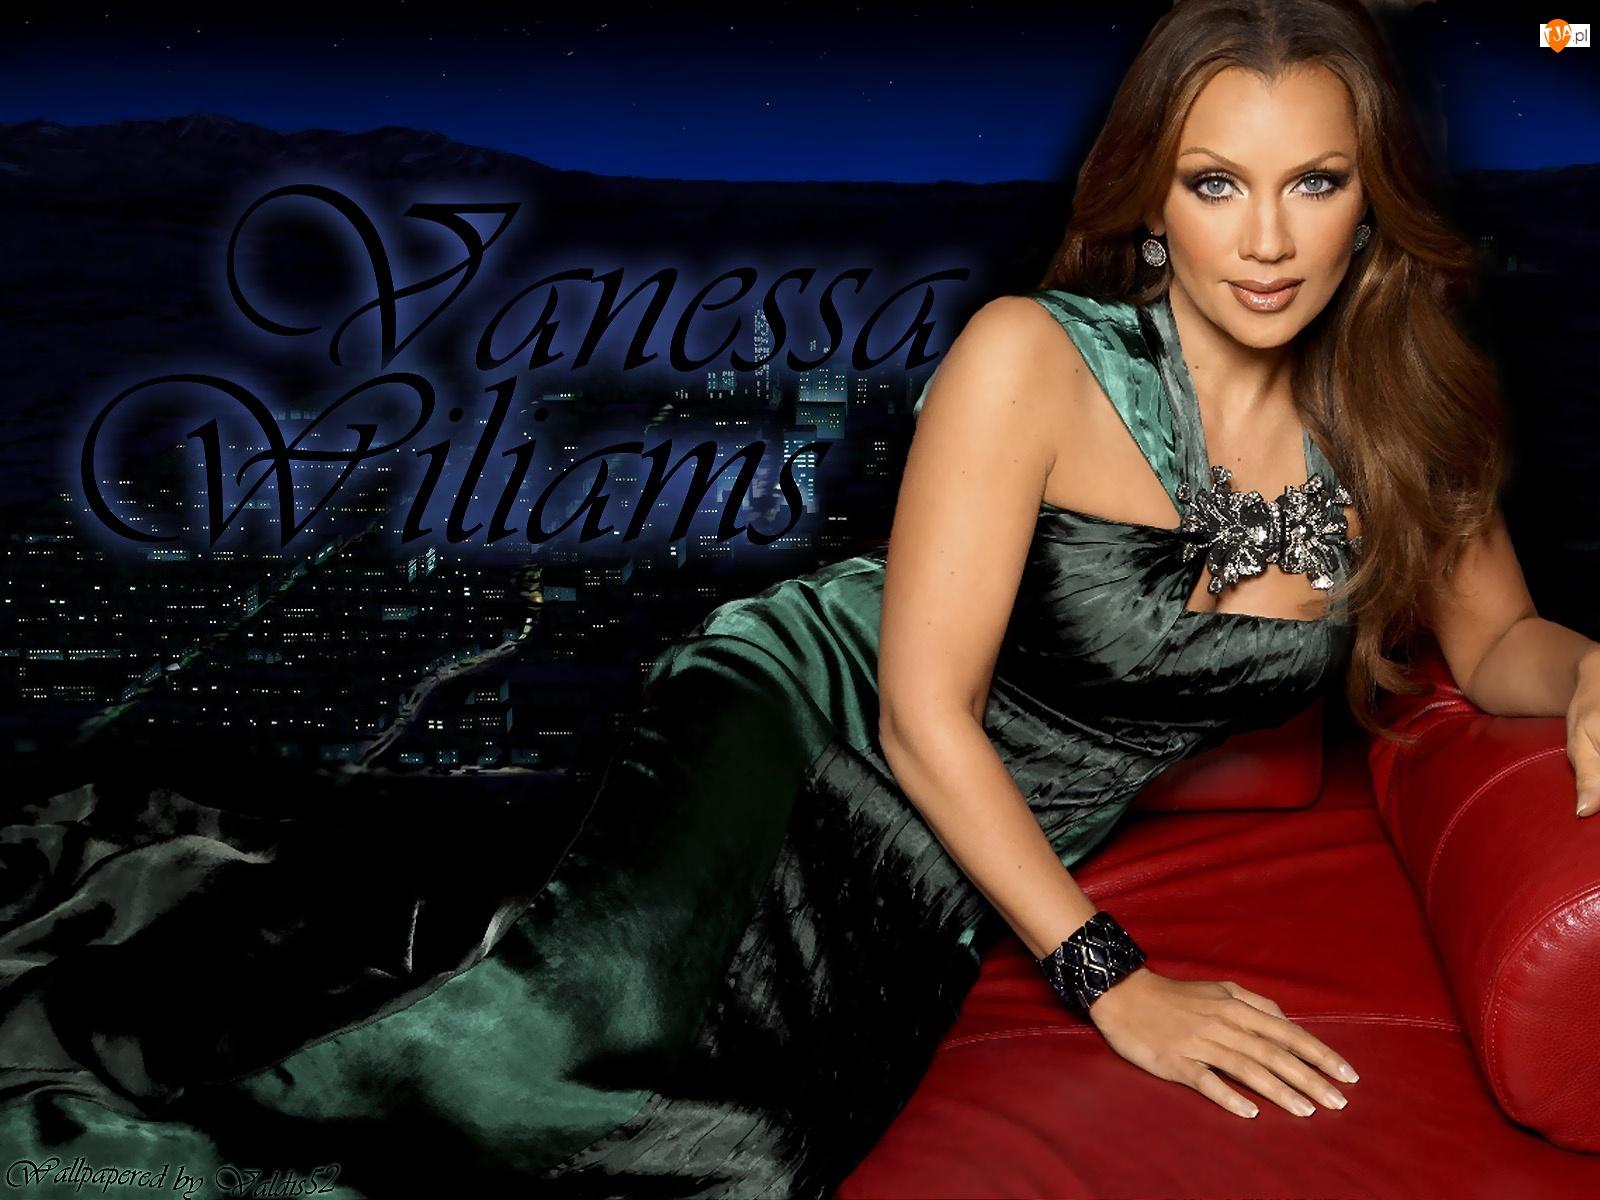 Piosenkarka, Vanessa Williams, Aktorka